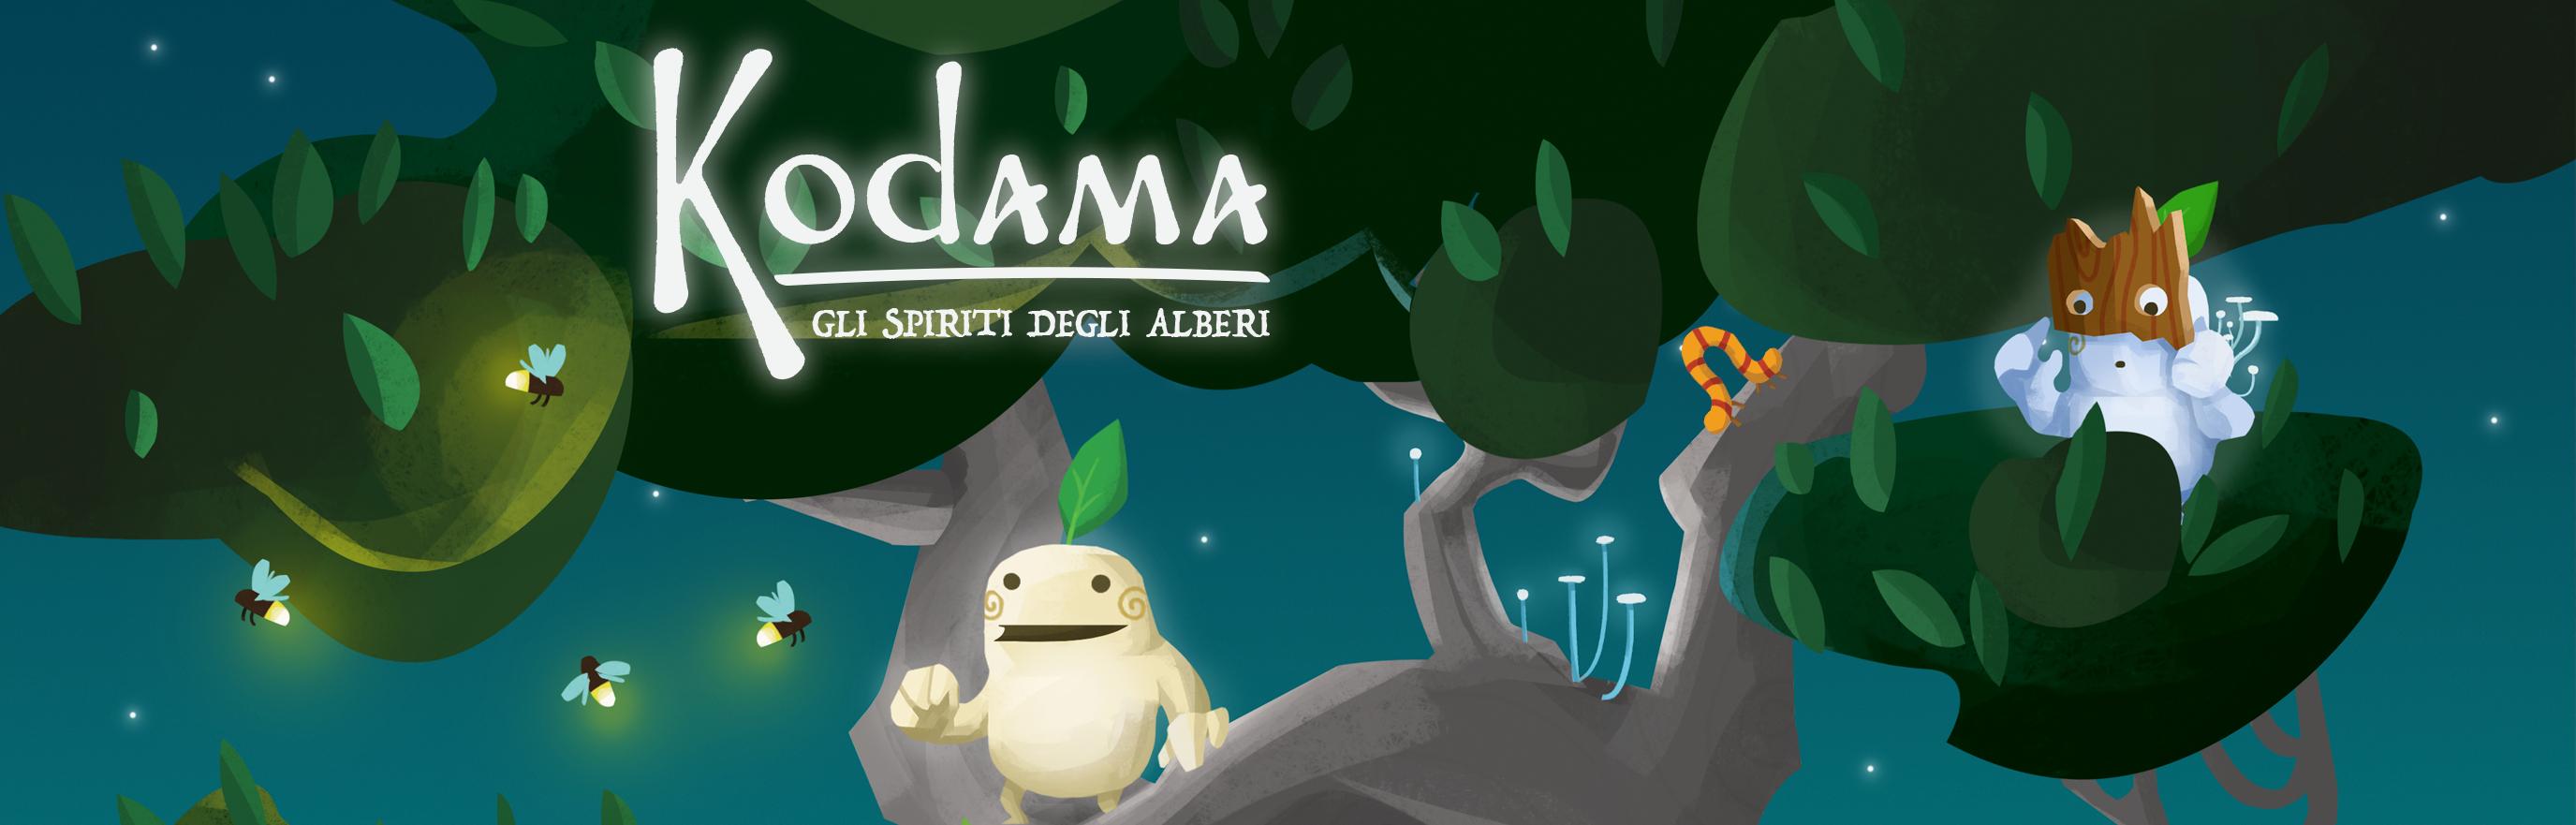 Kodama_Web_Header